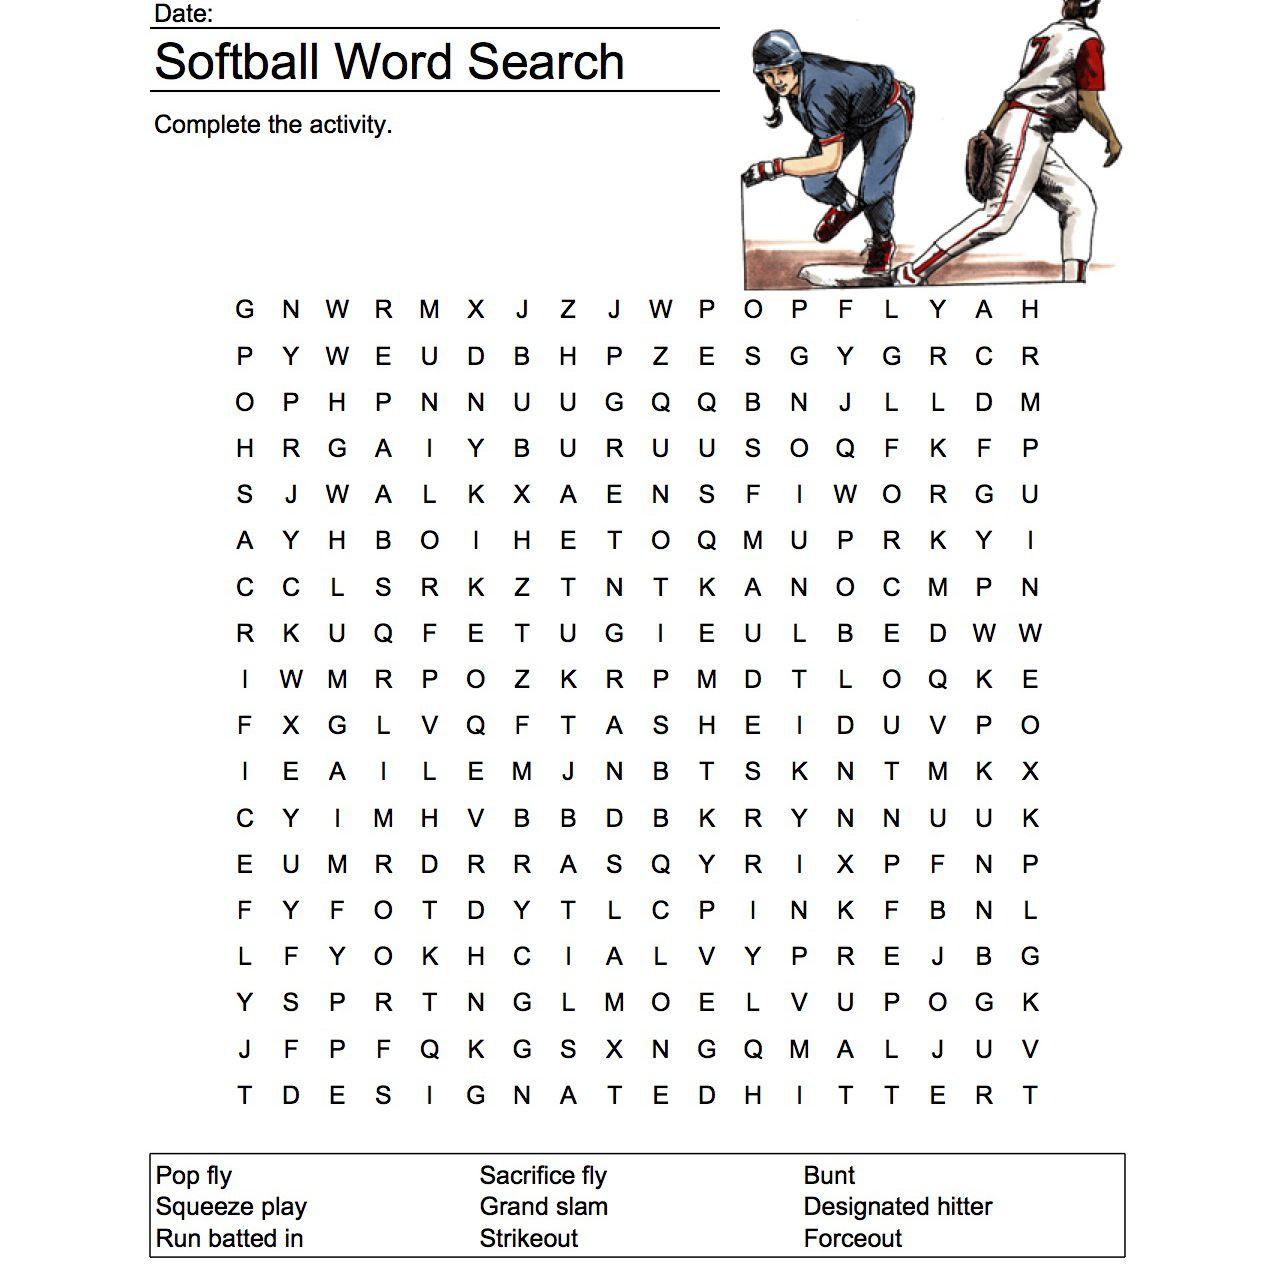 Softball Word Search